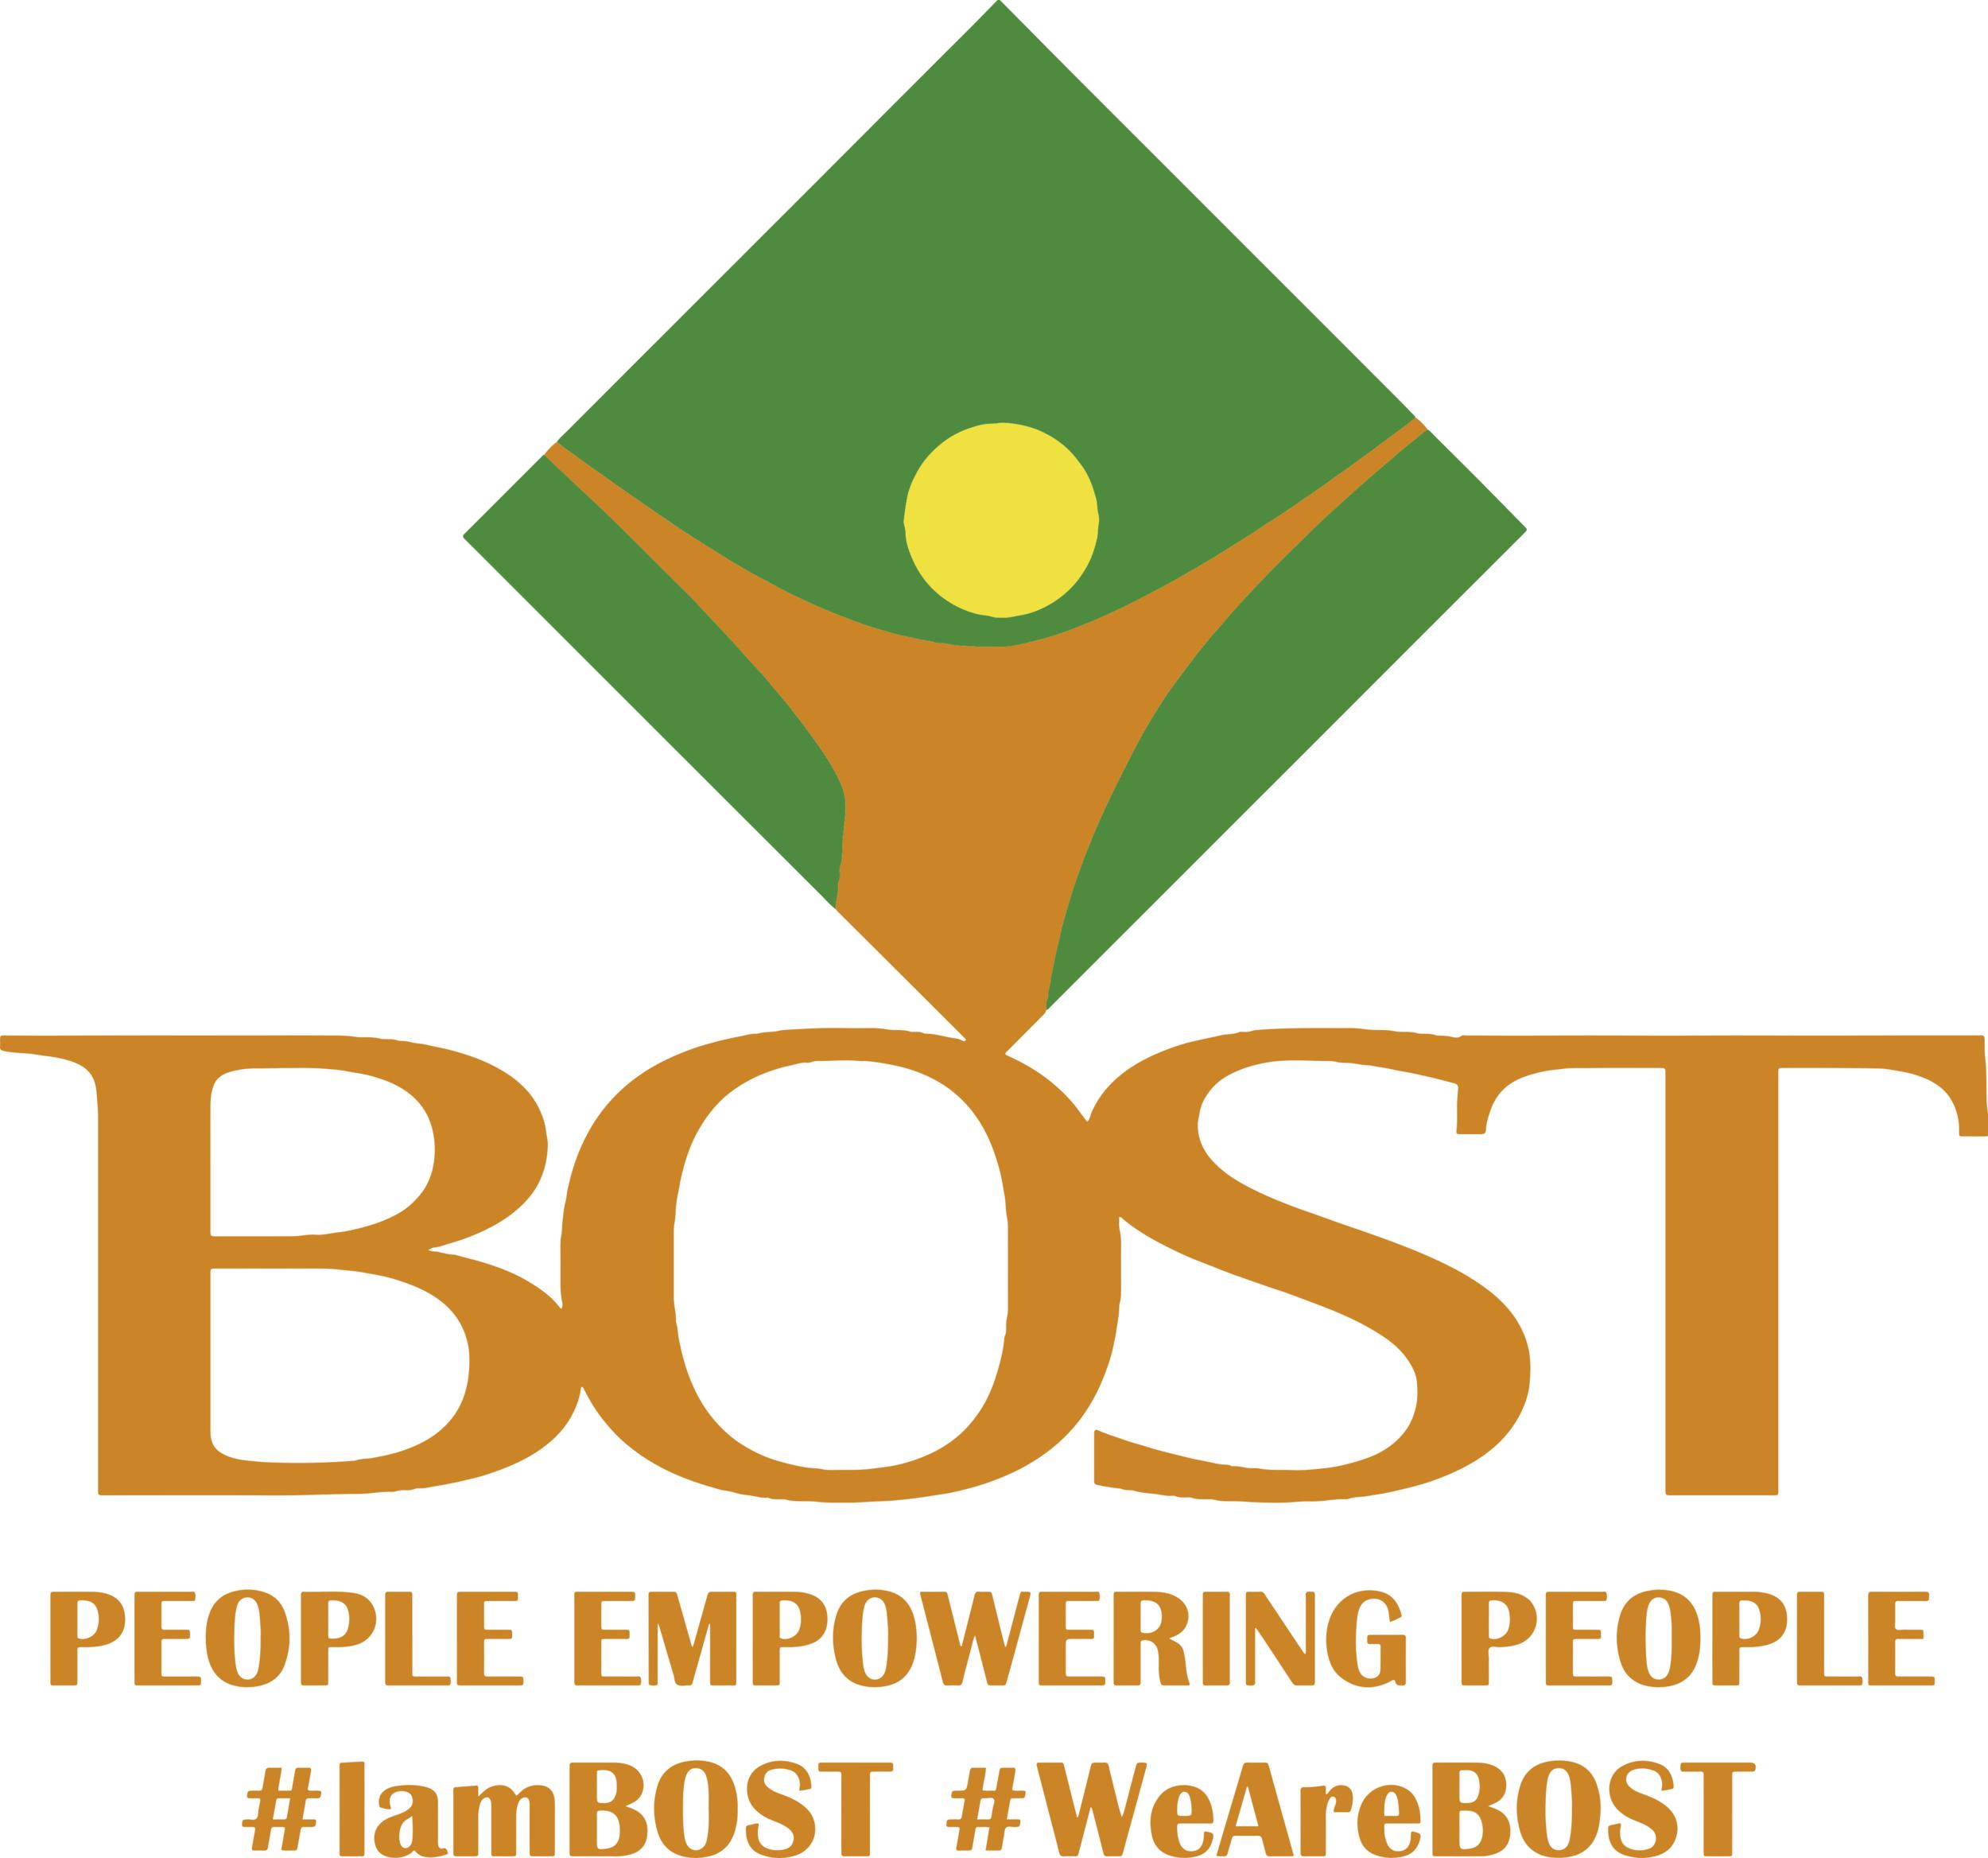 bost vector logo 08.2018.png